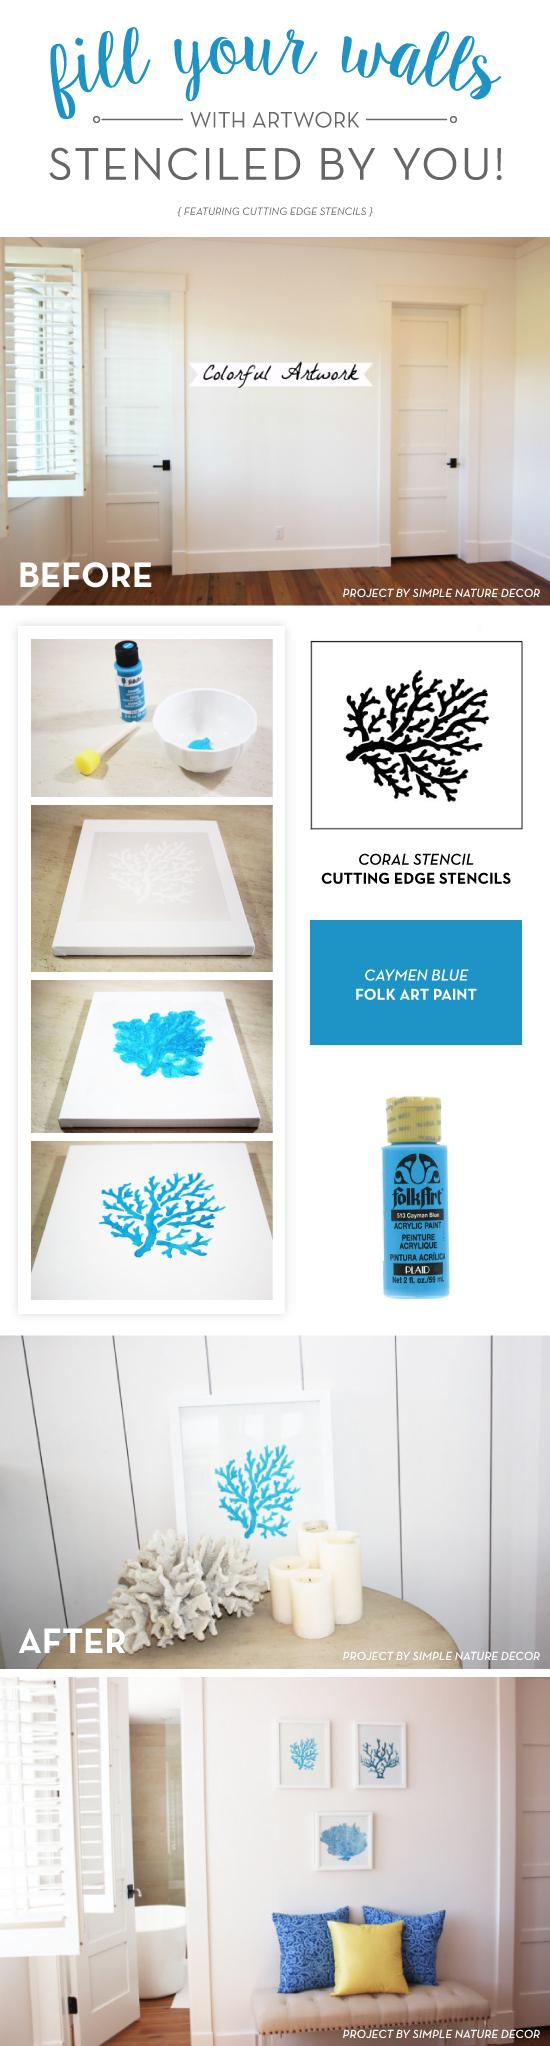 Cutting Edge Stencils shares how to stencil DIY artwork for your blank walls using craft stencils. http://www.cuttingedgestencils.com/beach-style-decor-coral-stencil.html